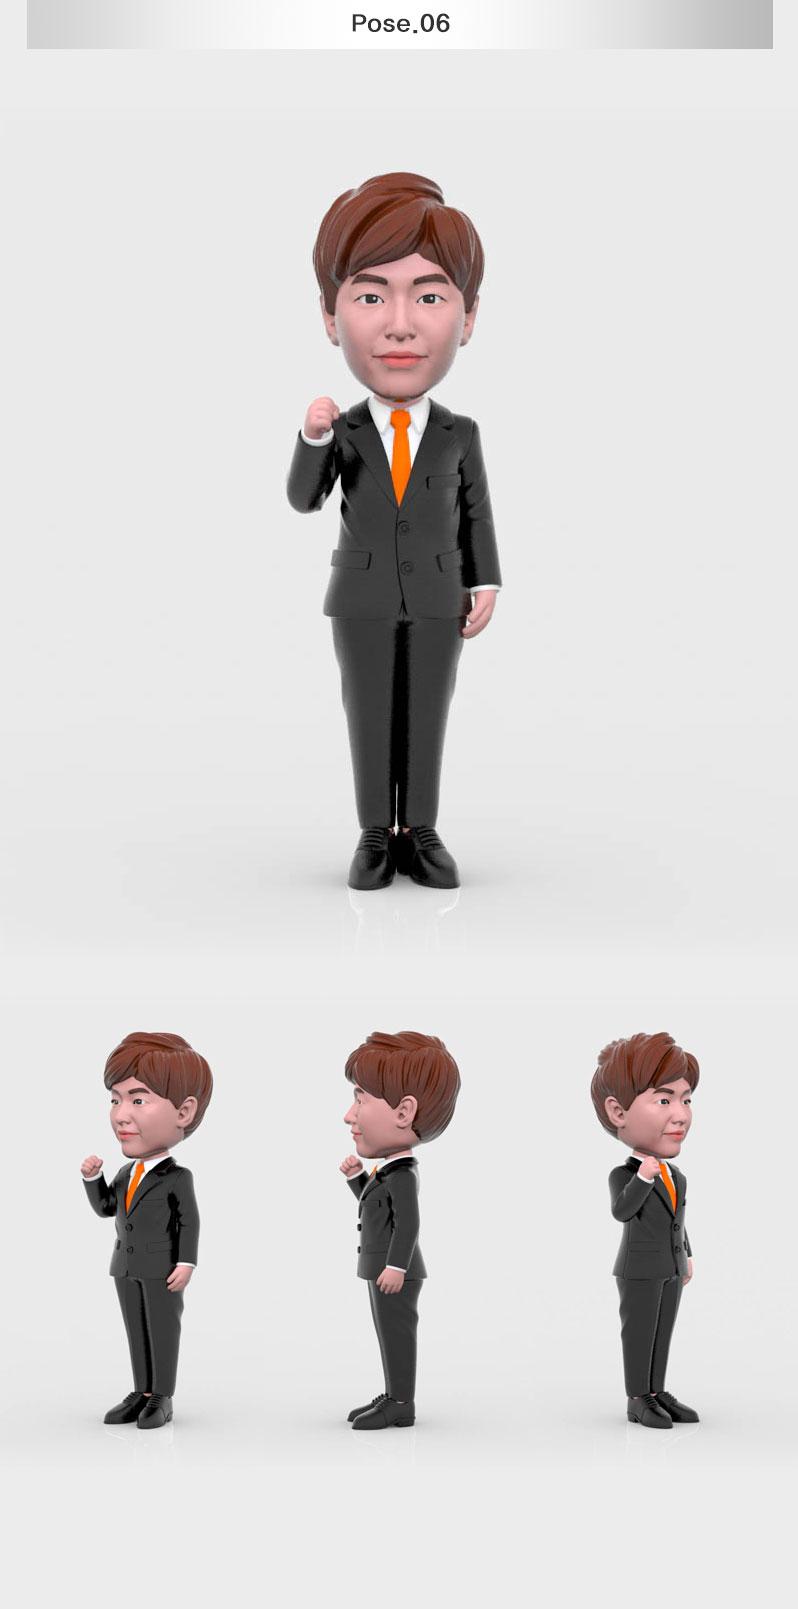 suit_pose06